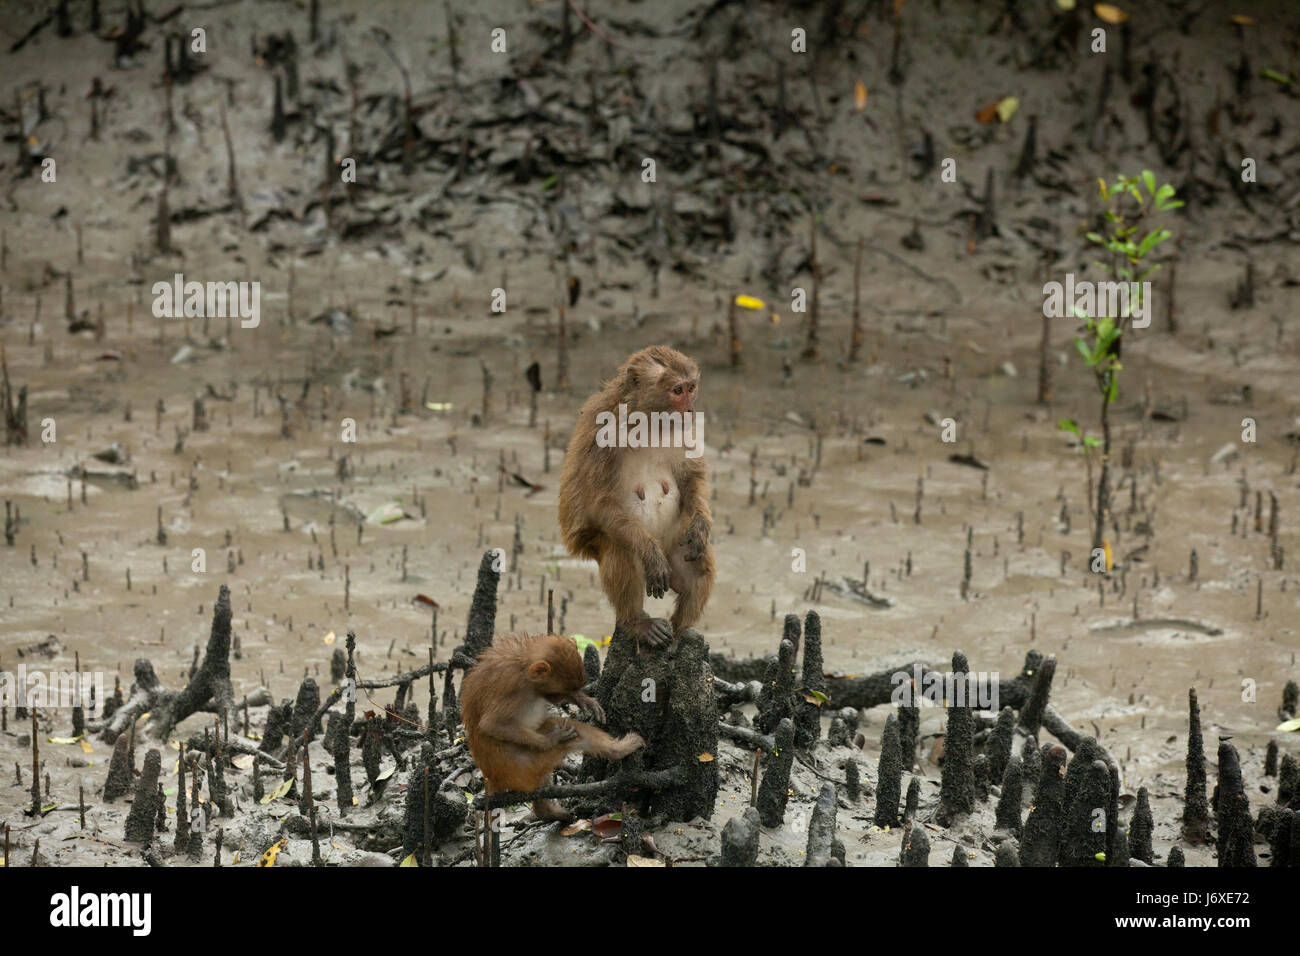 Rhesus monkey at the Kolagachia Eco Tourism Centre in the Sundarbans, a UNESCO World Heritage Site and a wildlife - Stock Image